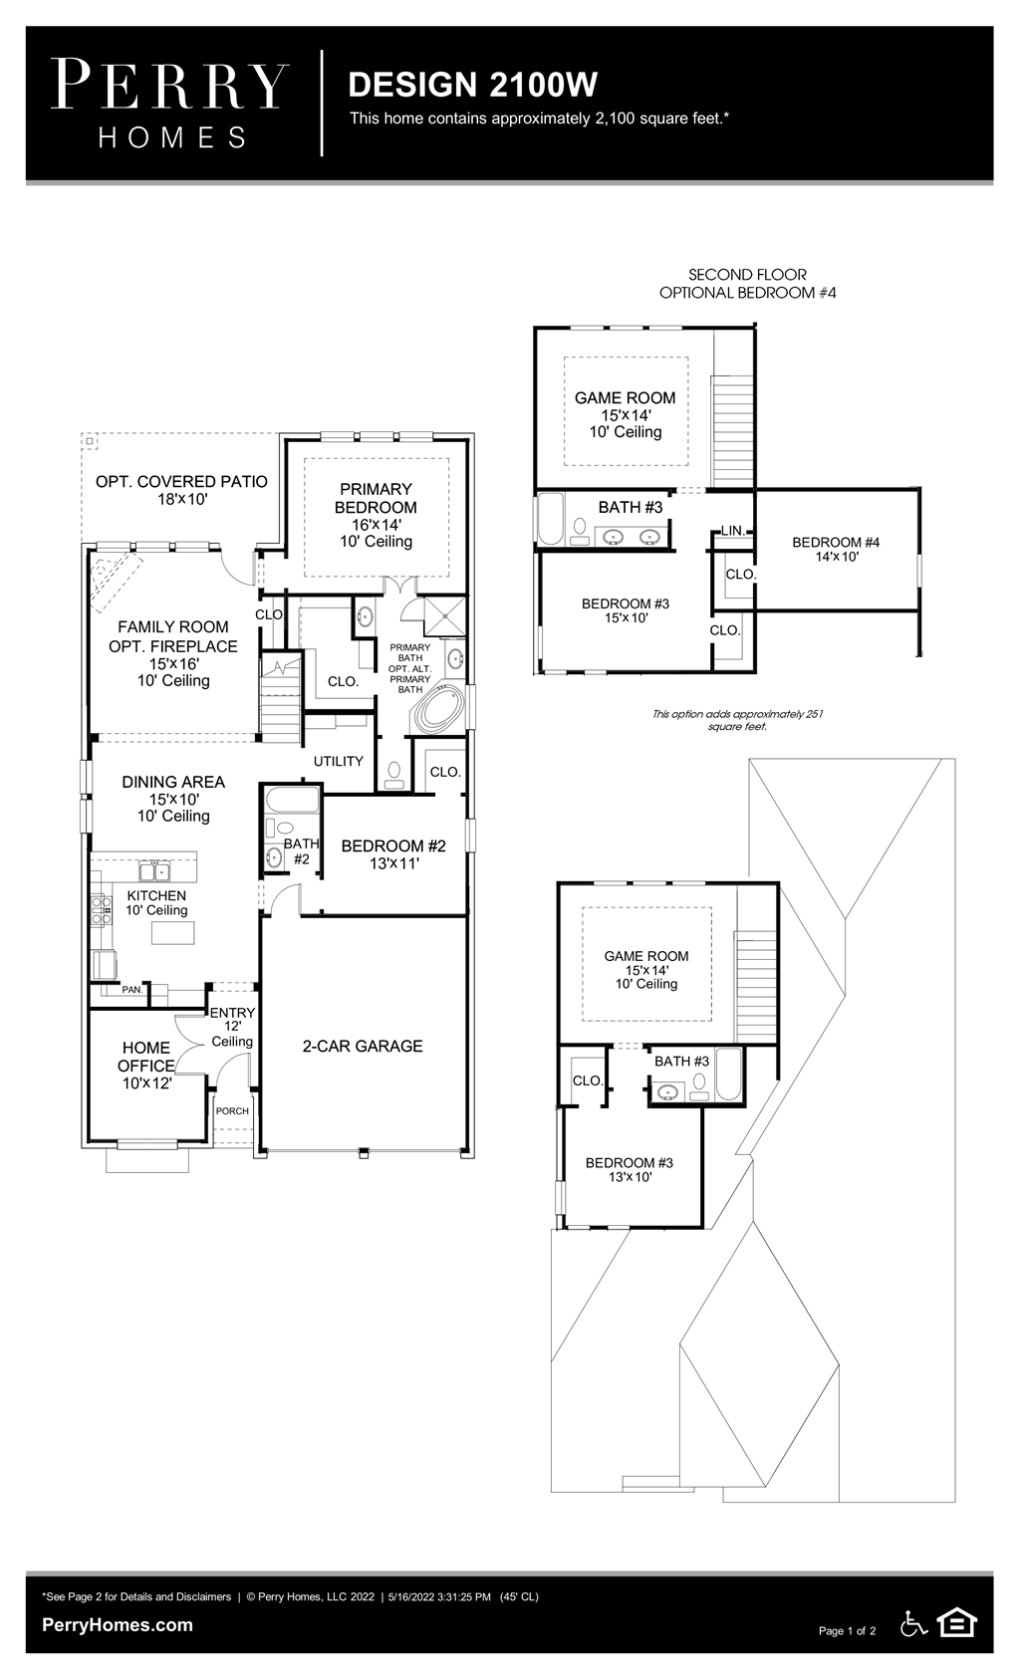 Floor Plan for 2100W